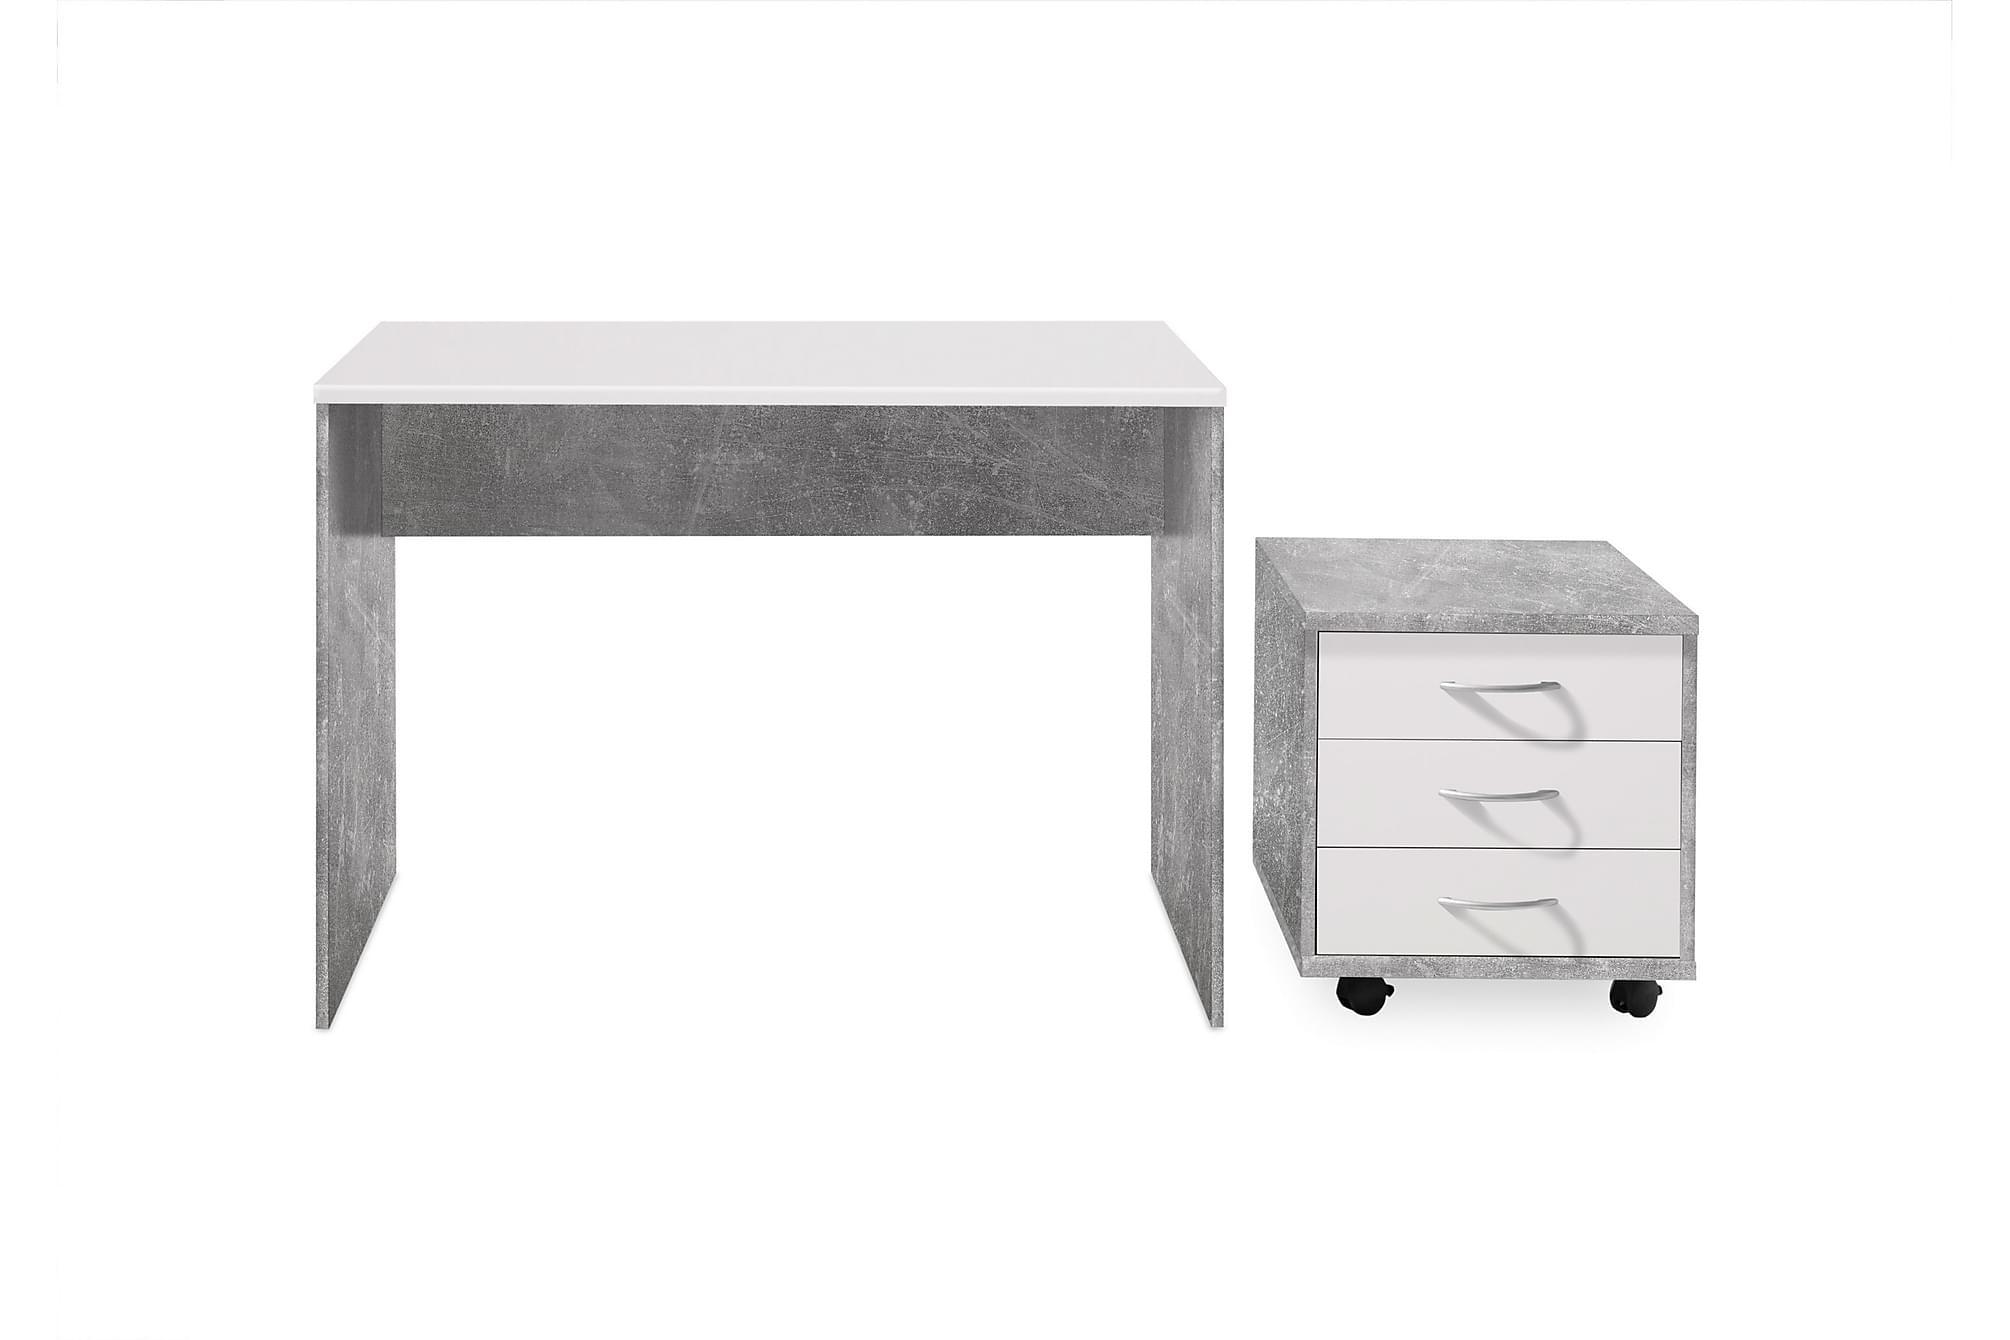 GERRARD Skrivbord 106 cm Grå/Vit